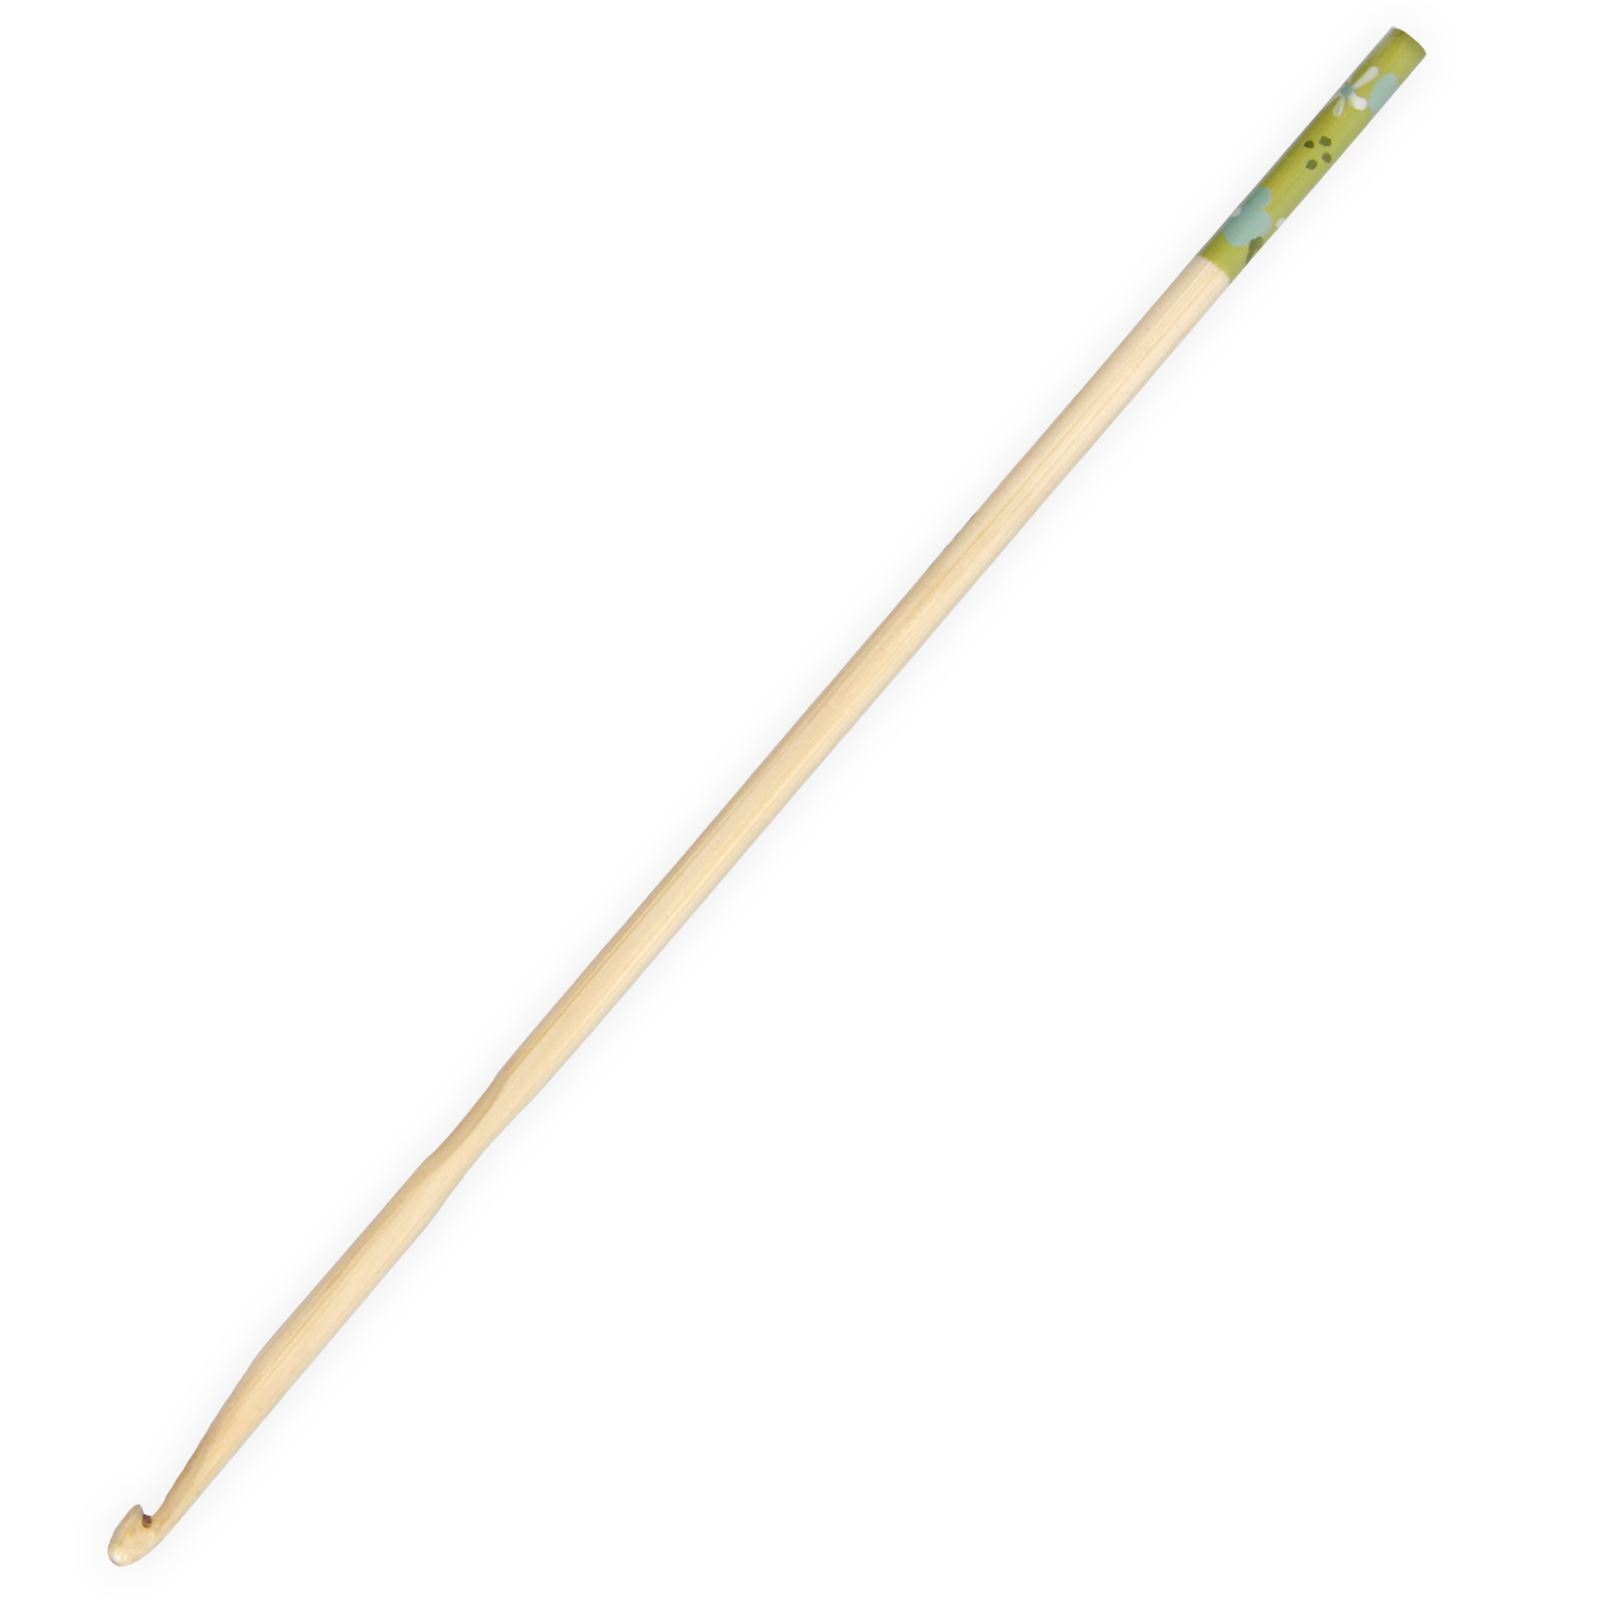 Knitting Needle Size 5mm : Dmc bamboo crochet hooks sizes mm